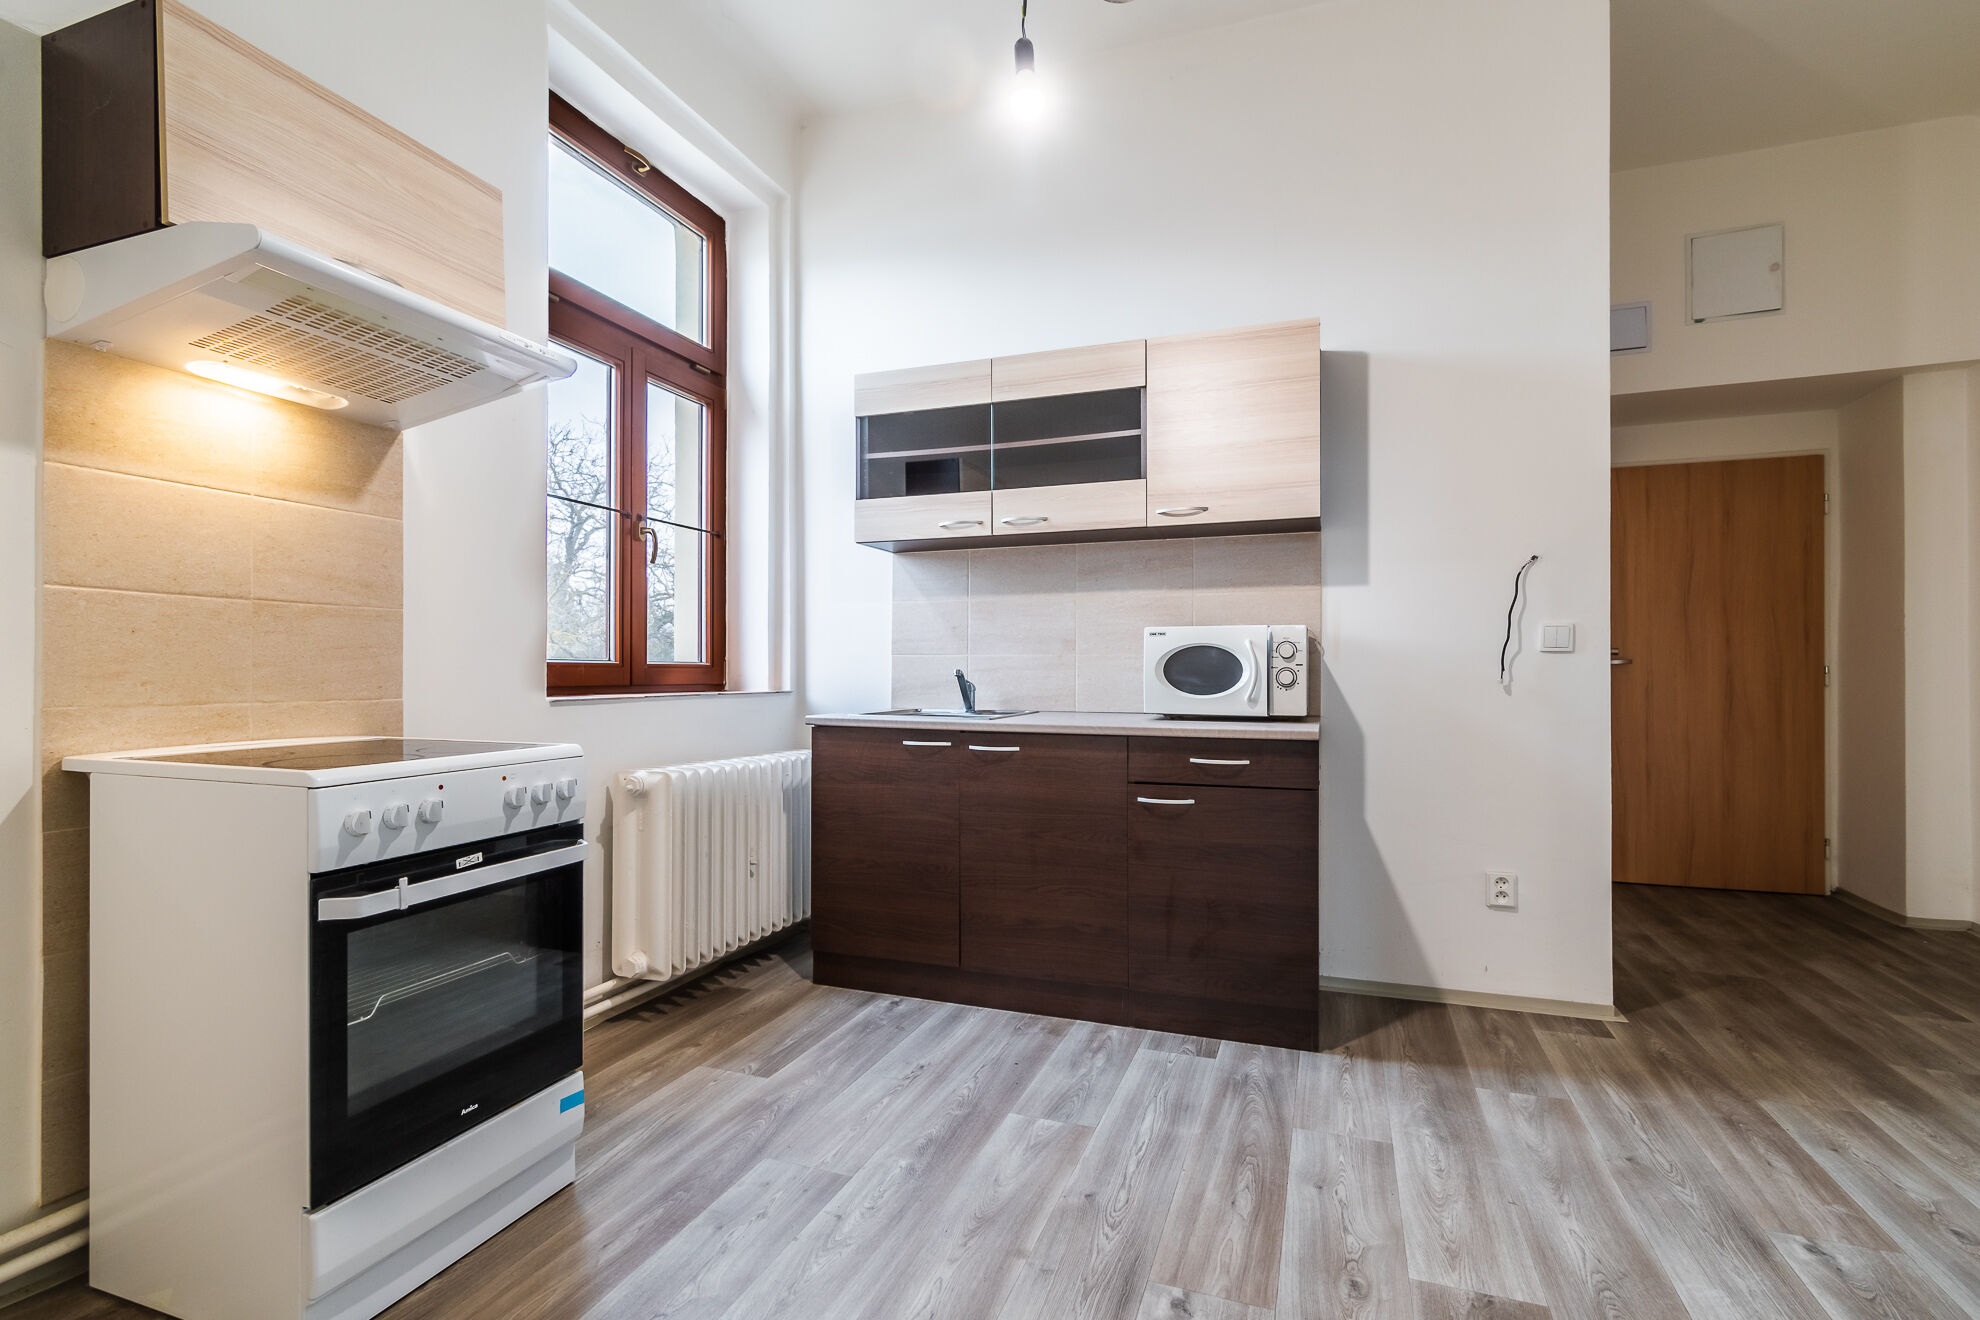 Pronájem bytu 1+1 - 38 m², Praha - Radotín